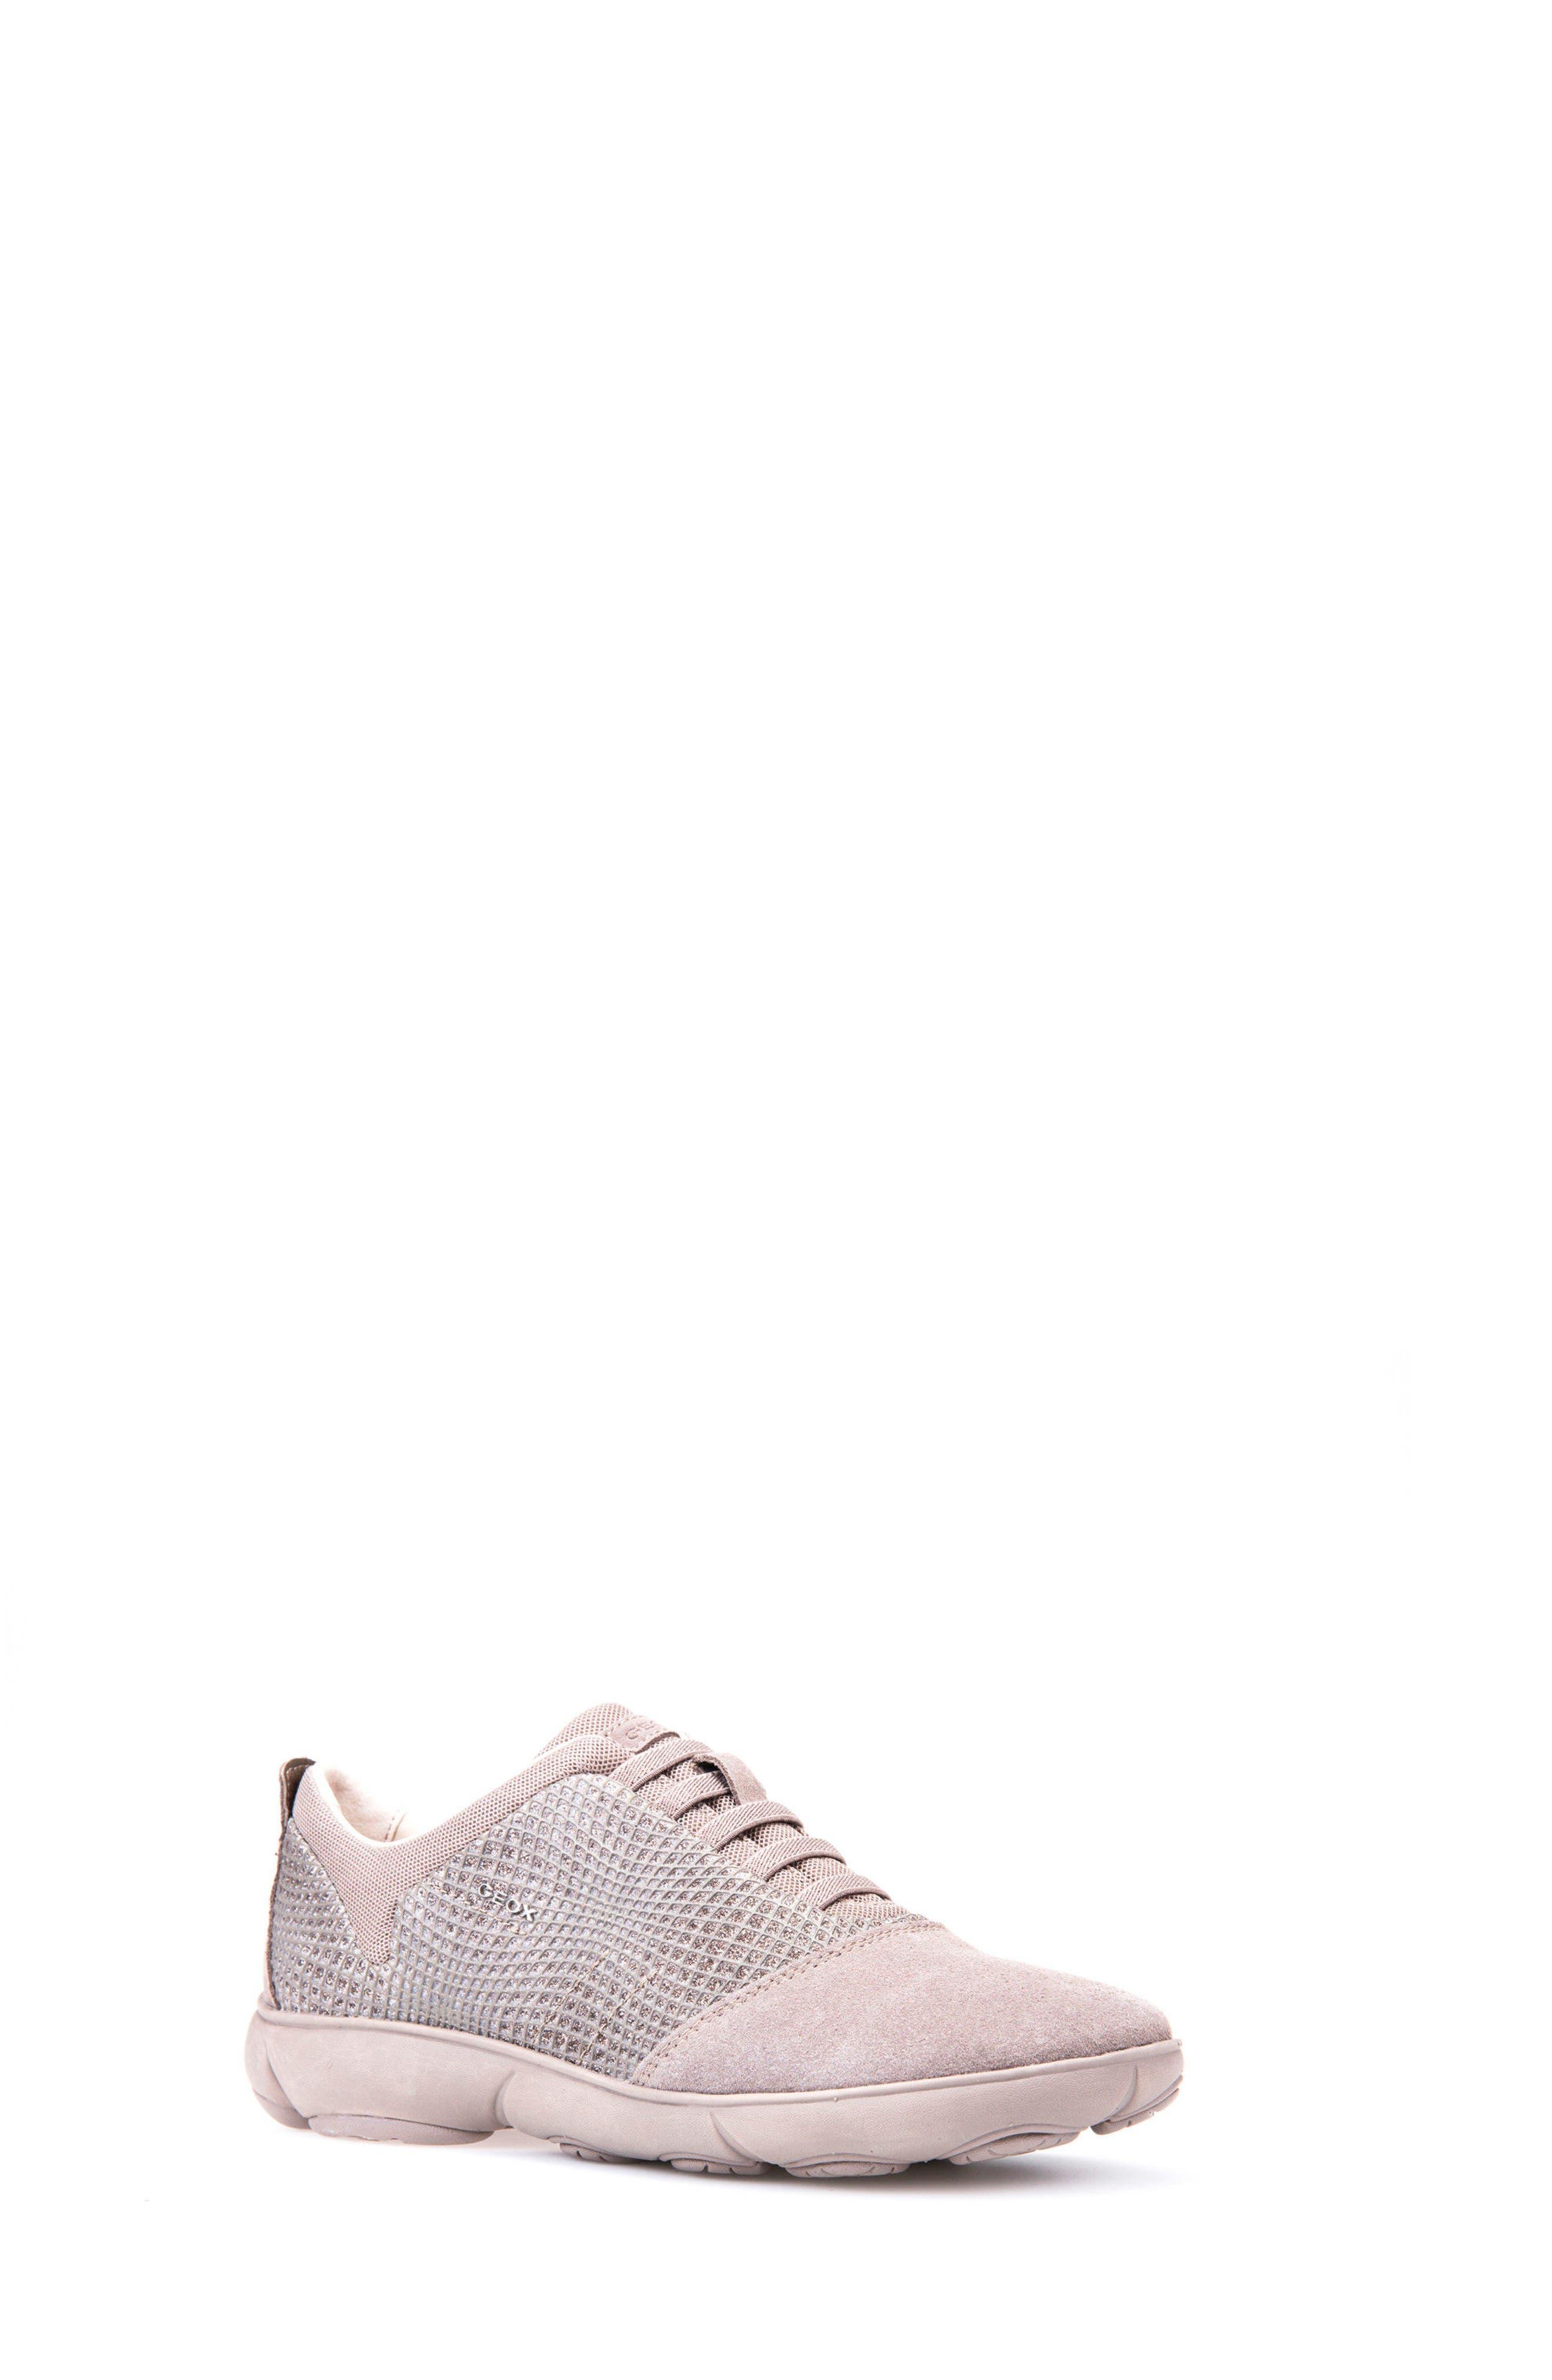 Nebula Slip-On Sneaker,                         Main,                         color, Taupe